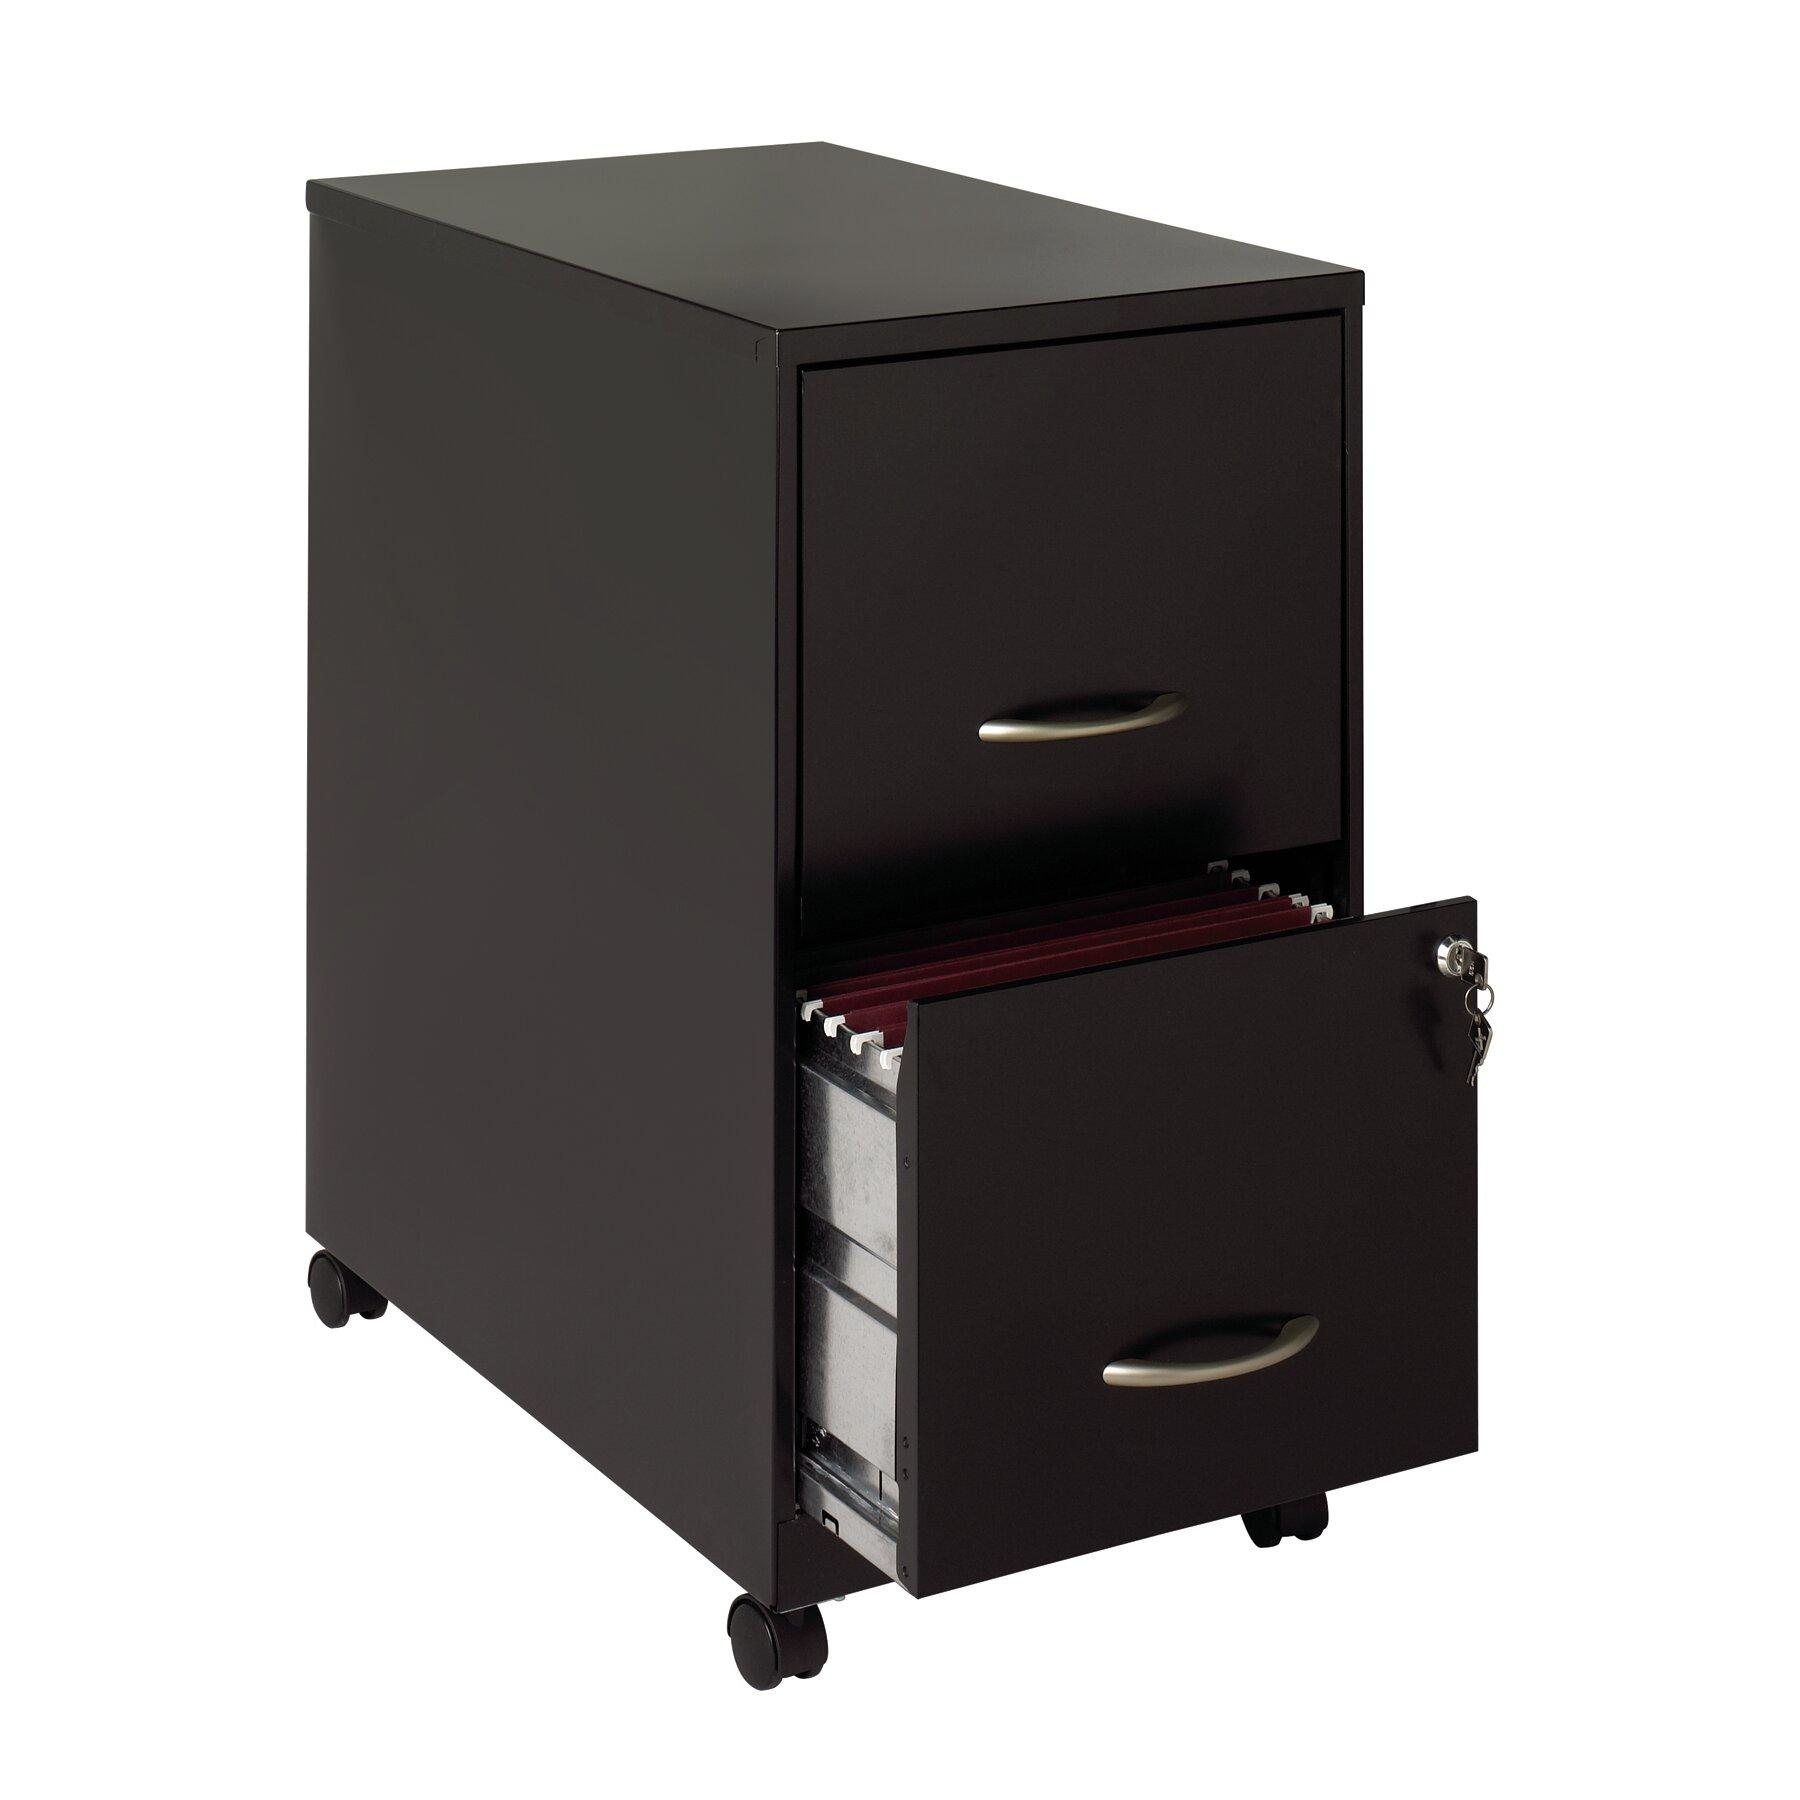 Hirsh industries 2 drawer soho mobile pedestal file for Industrie mobel